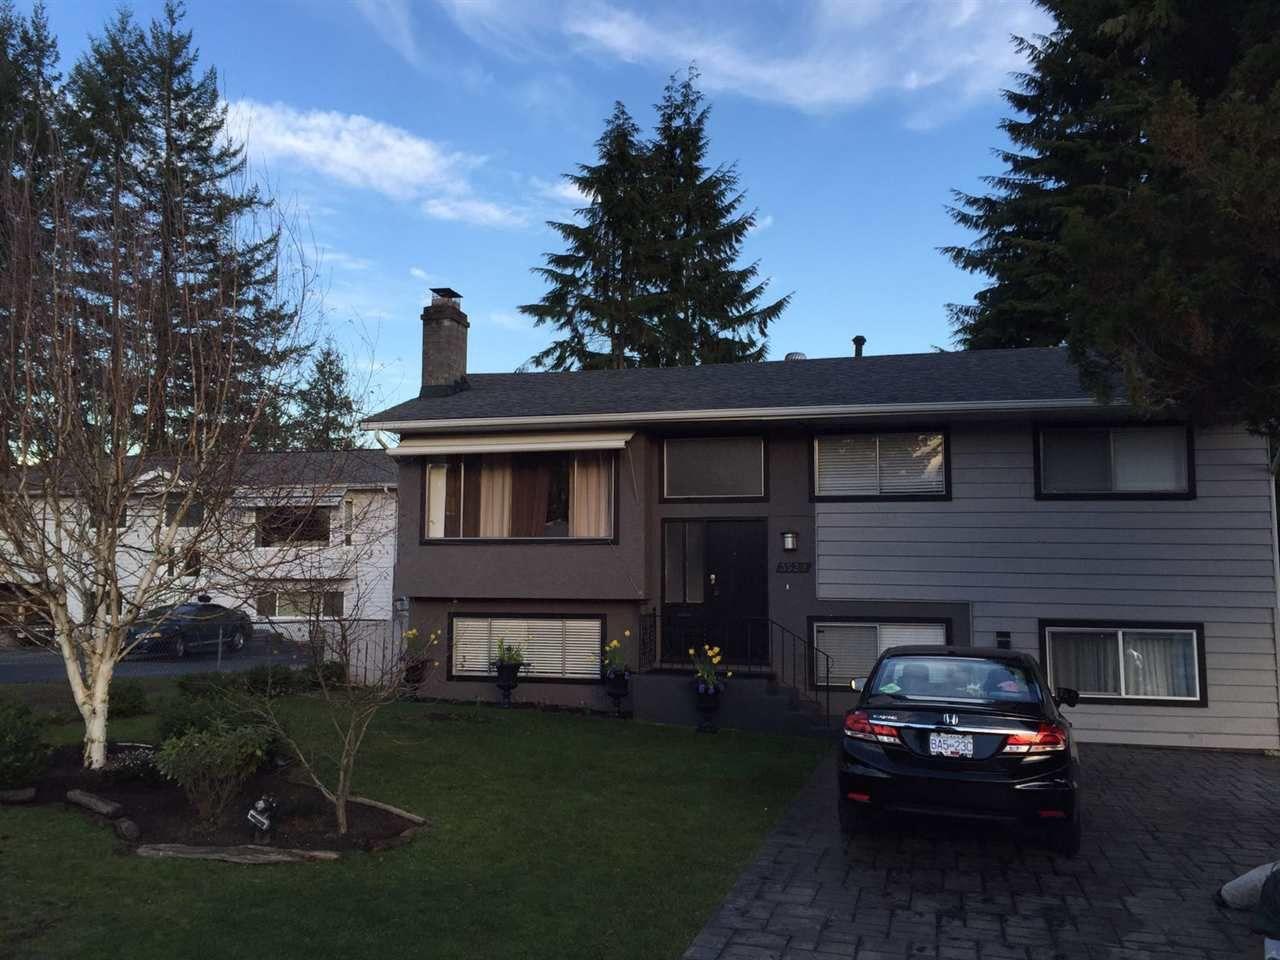 Main Photo: 3522 FLINT Street in Port Coquitlam: Glenwood PQ House for sale : MLS®# R2033048